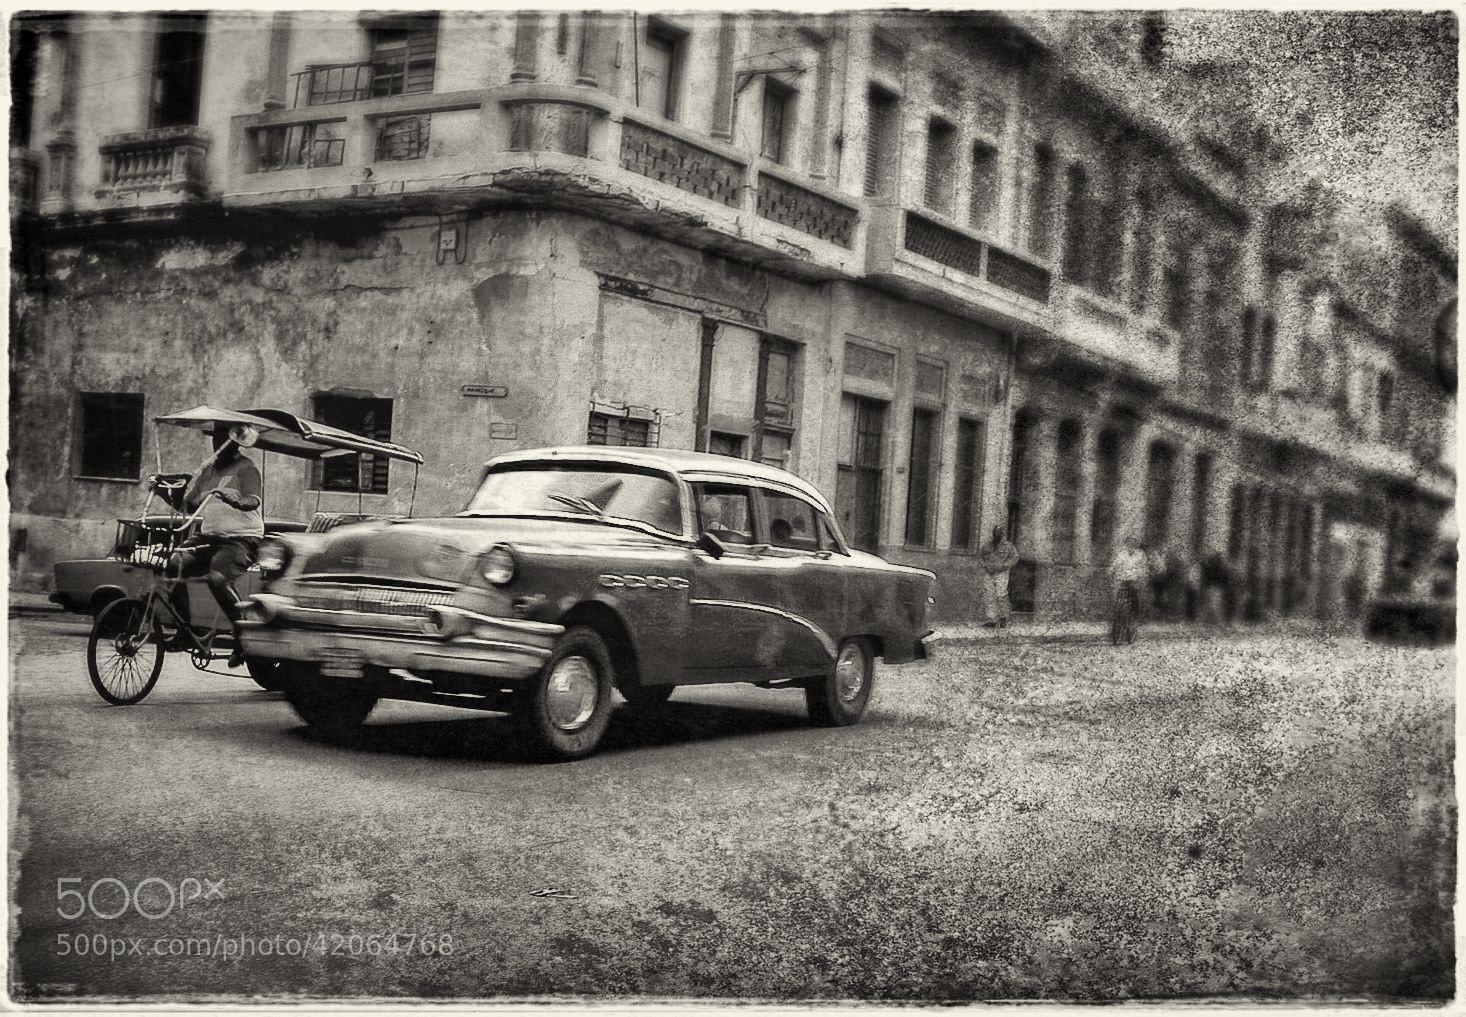 Photograph Habana Vieja by Luis Mariano González on 500px